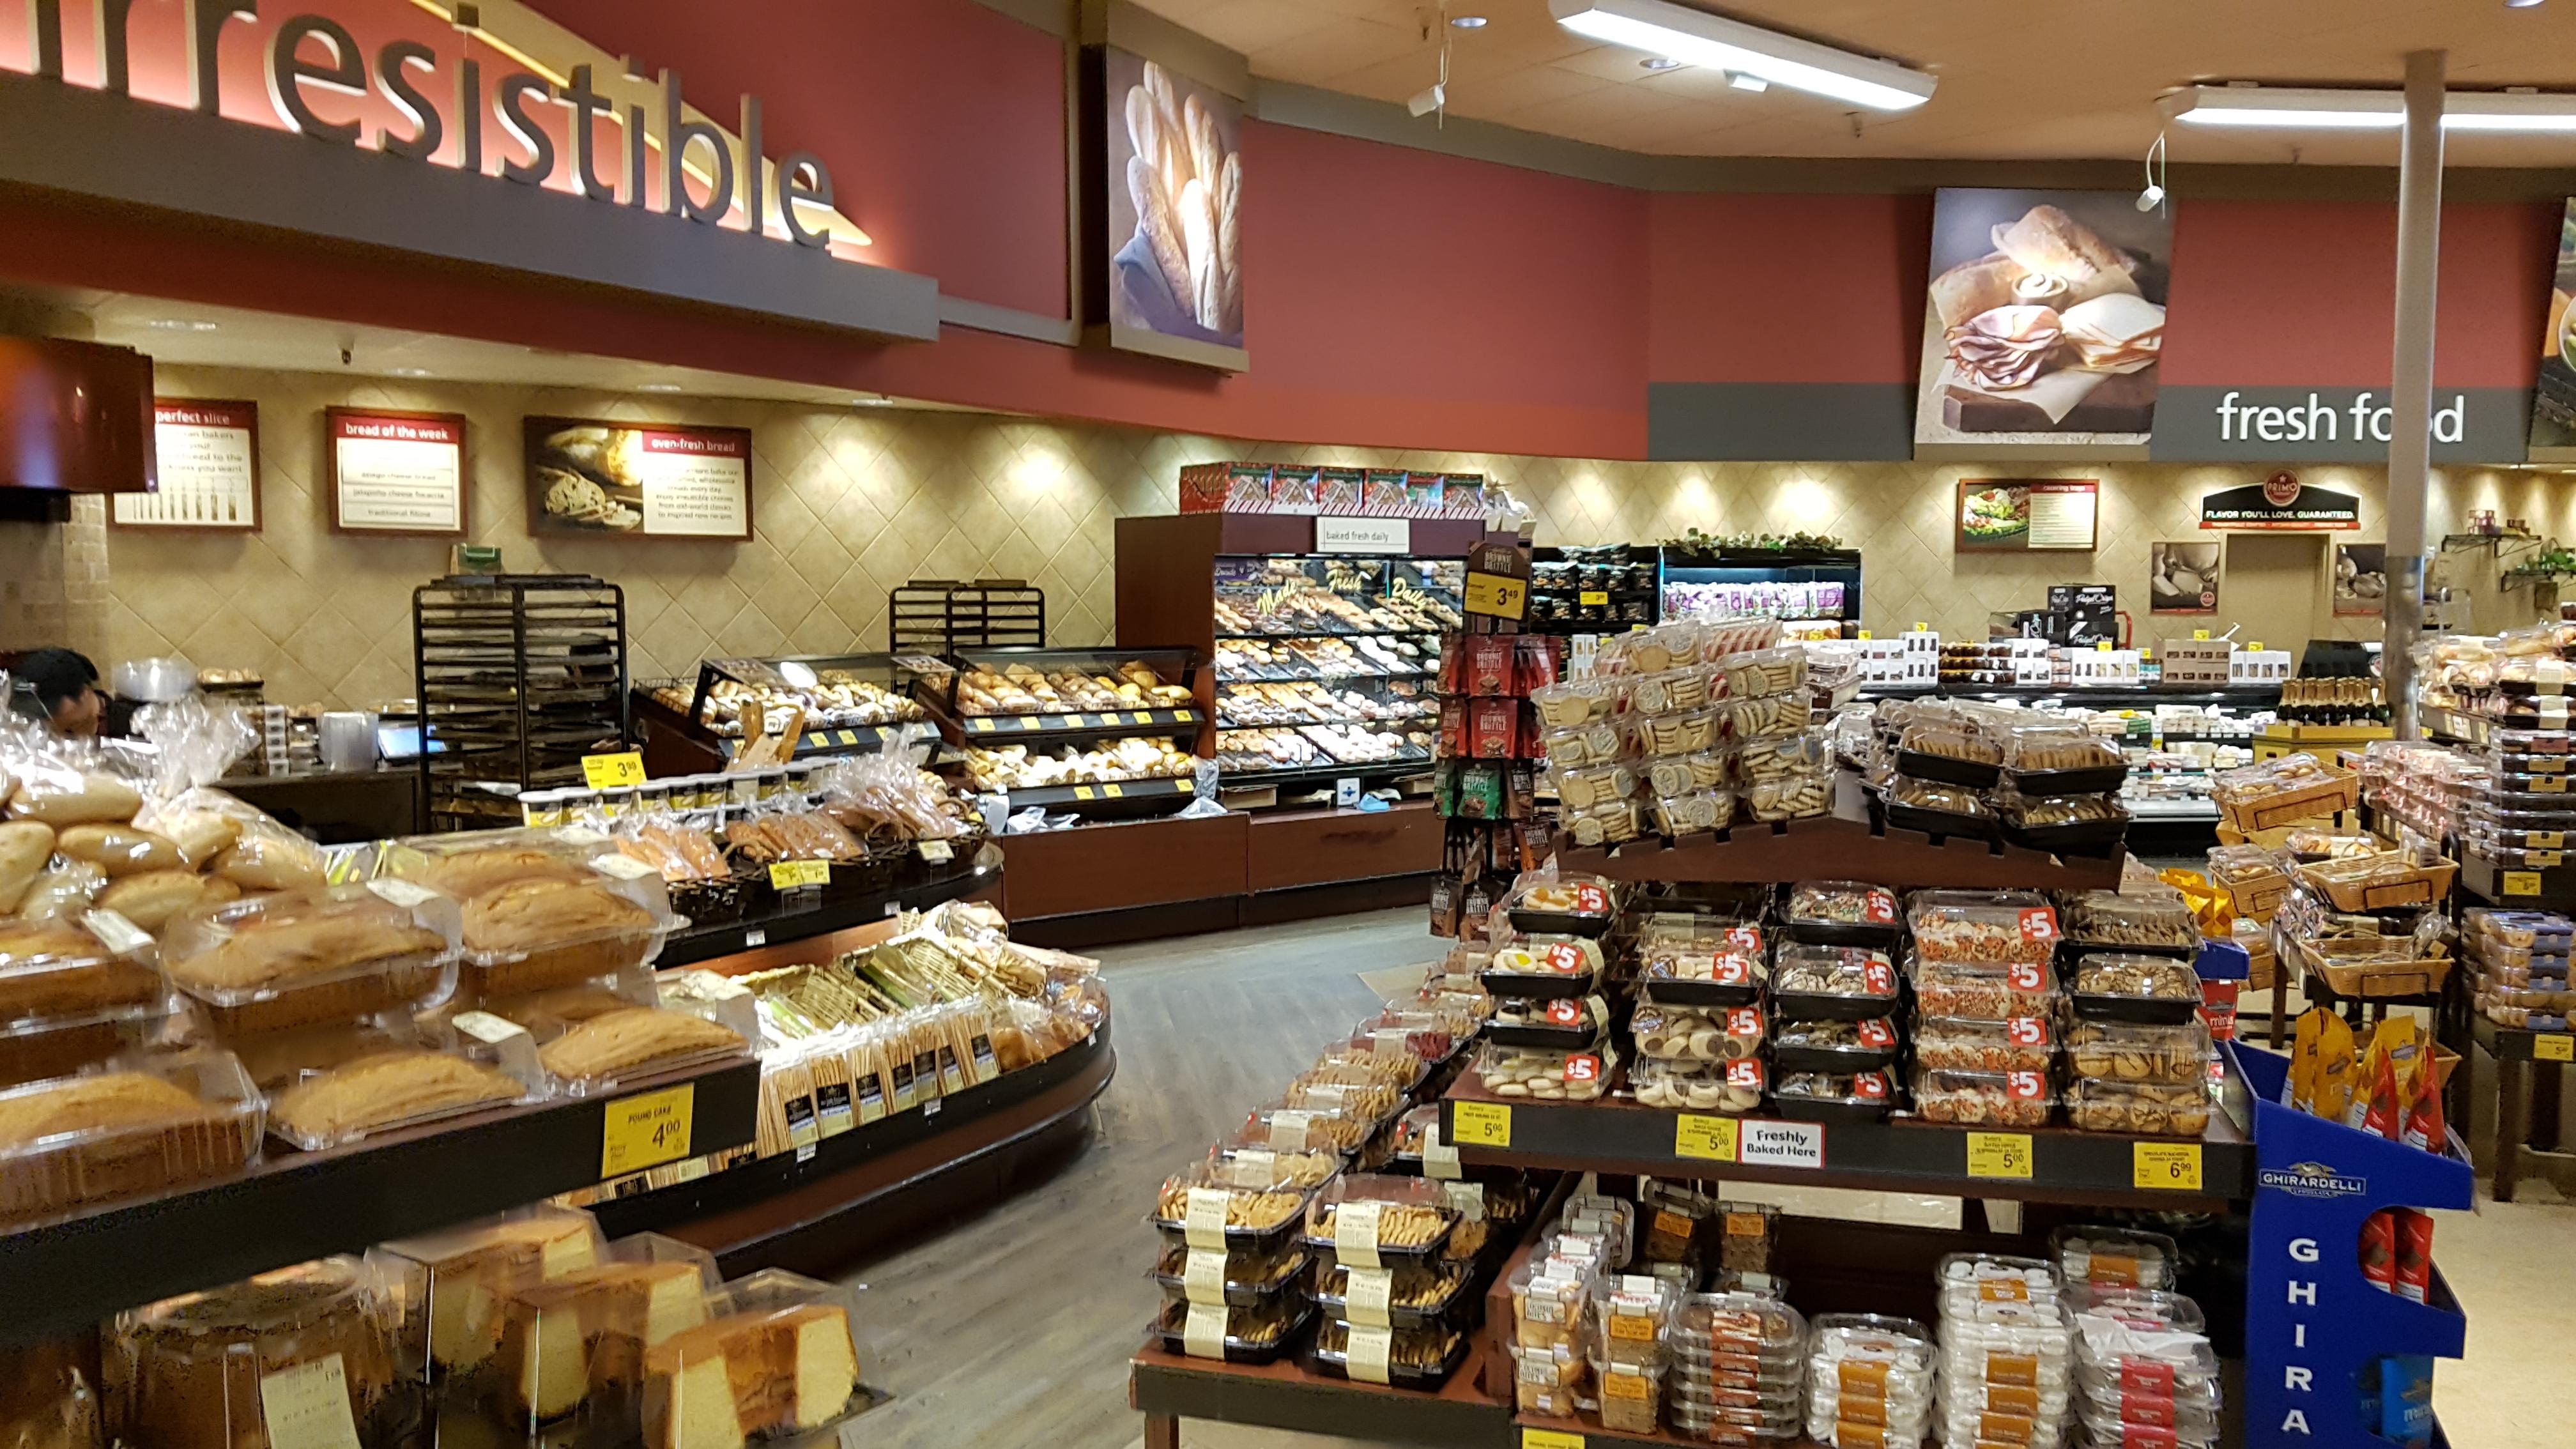 avocado, chia, emart express, Golden Gate Park, homeplus express, jumbo pastries, Las Vegas, organic 쥬스, pastries, peanut butter cookie, SAFEWAY, SF, suja, Walgreens, [샌프란시스코] 가장 애용한 마트 Safeway, 가격, 가격대, 간식, 개구리알, 건강, 건강 쥬스, 건강할 수밖에 없는 음료, 과일, 과자, 다이어트, 대왕, 대왕 패스츄리, 대형 빵, 마트, 마트 추천, 맴버쉽, 물가, 미국, 미제, 민트차, 복잡, 빵, 사과, 상추, 샌프란시스코, 샐러리, 생필품, 세이프웨이, 셀프 계산대, 쇼핑, 시금치, 식료품, 아보카도, 아이 쇼핑, 알갱이, 오이, 월그린, 이마트 익스프레스, 이용, 장난감, 재팬 타운, 점원, 차드, 초록초록, 초콜릿, 치아, 쿠키, 크기, 파슬리, 패스츄리, 패스트리, 포도, 포만감, 피넛버터 쿠키, 한국, 해독 쥬스, 호박